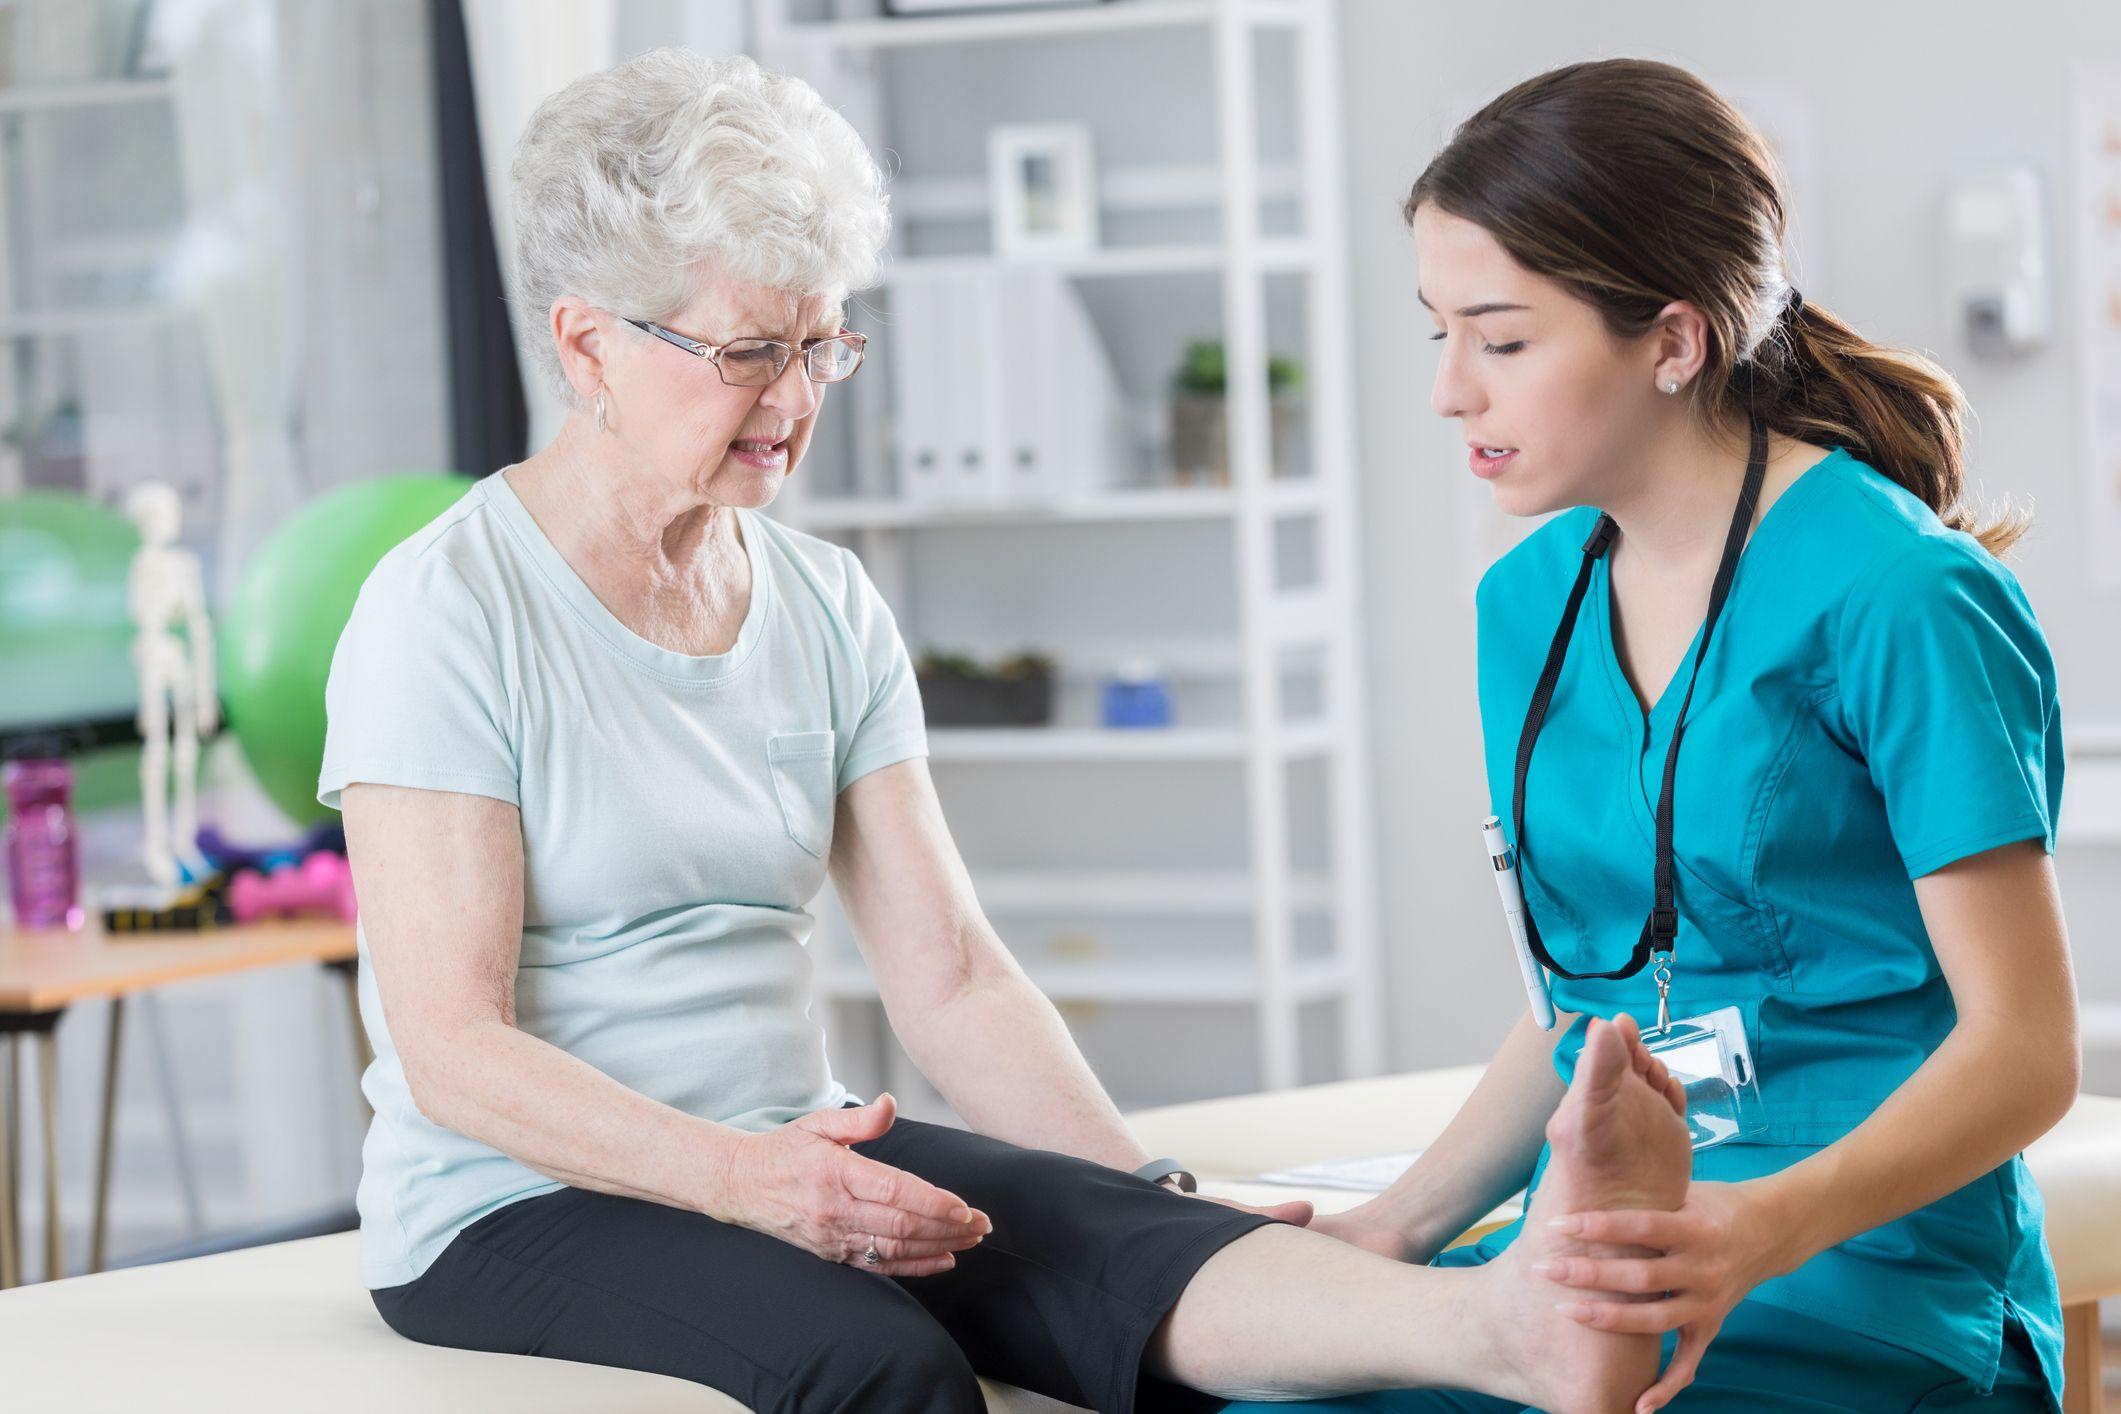 Celecoxib (Celebrex): for arthritis